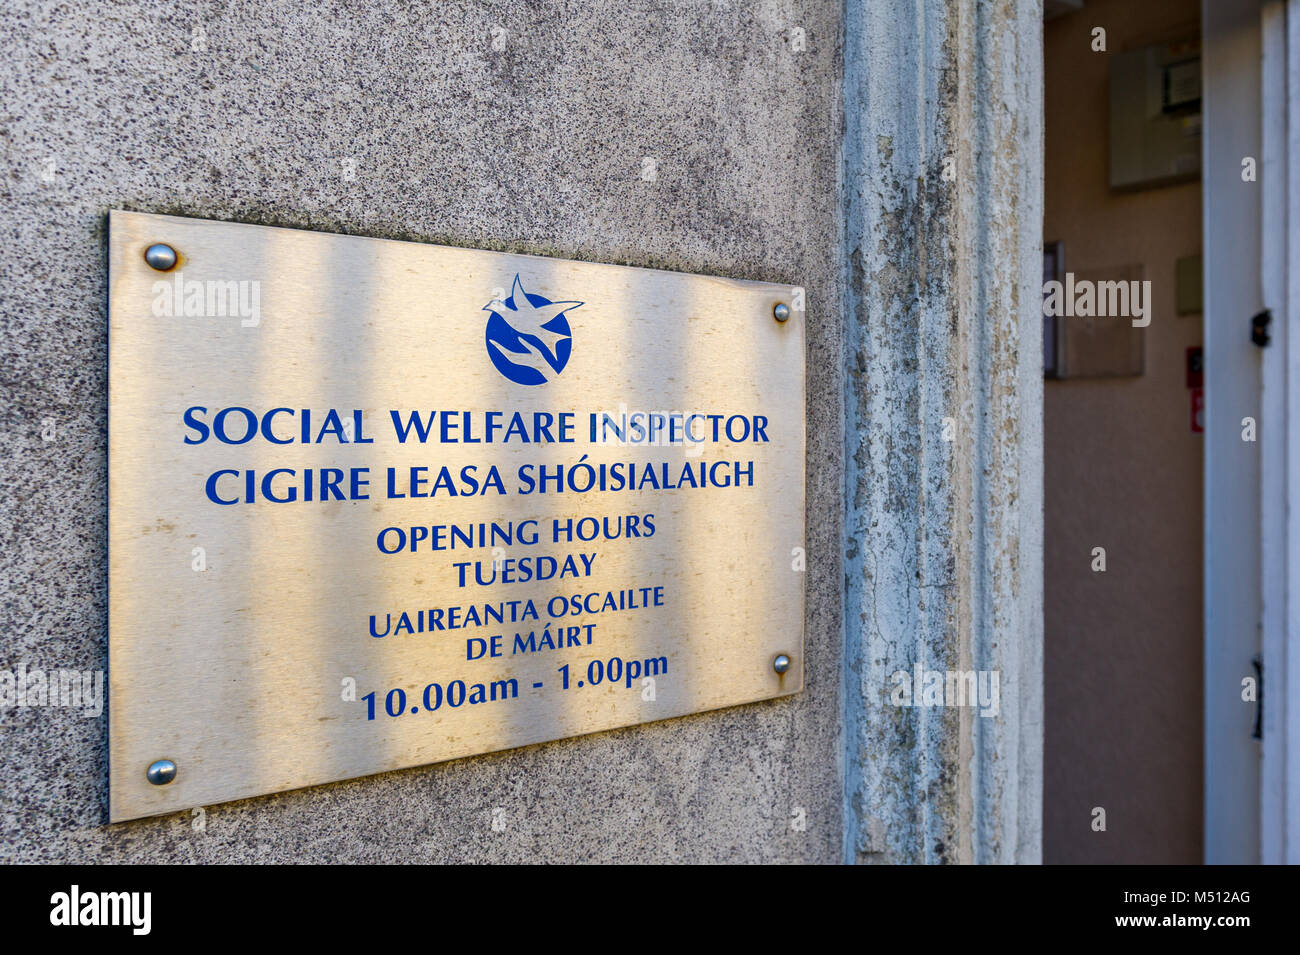 Social Welfare Inspector office opening hours sign in Dunmanway, County Cork, Ireland. - Stock Image